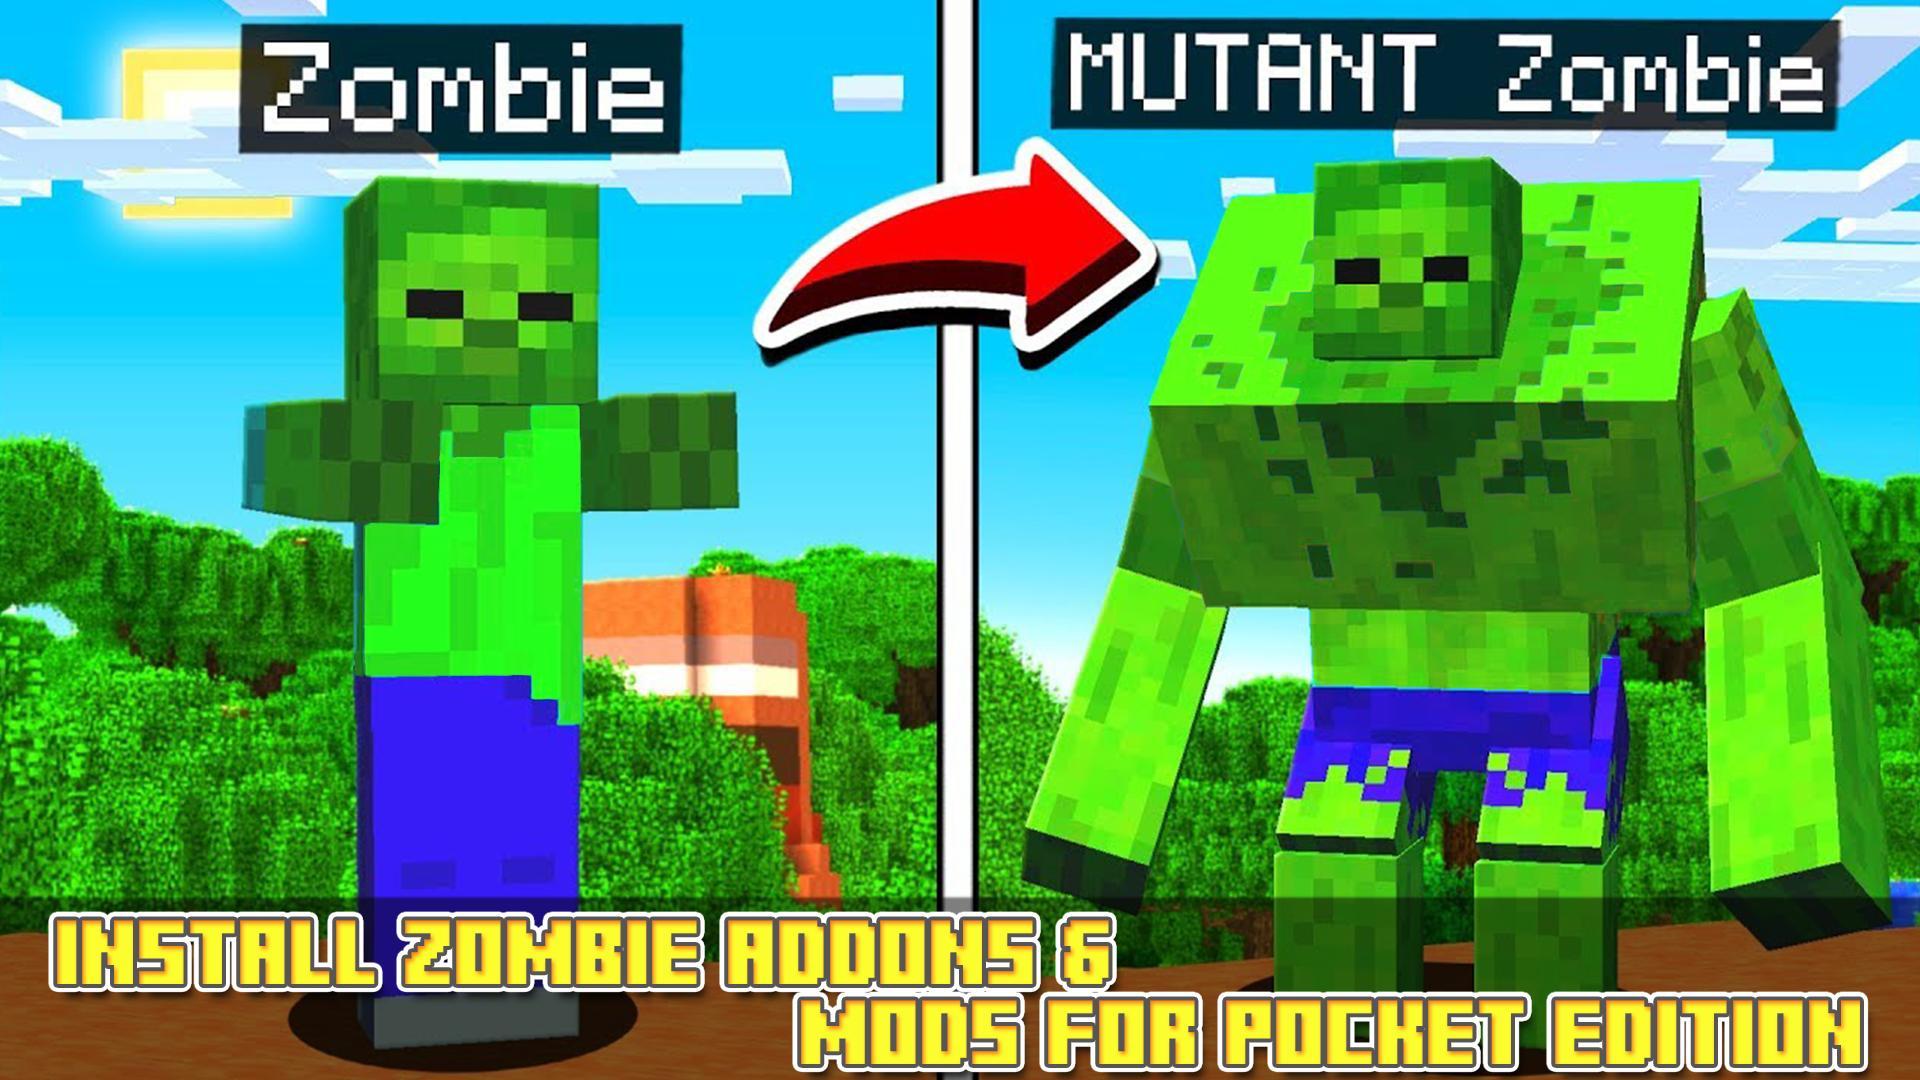 Mutant Mod - Zombie Addons and Mods 1.1 Screenshot 5